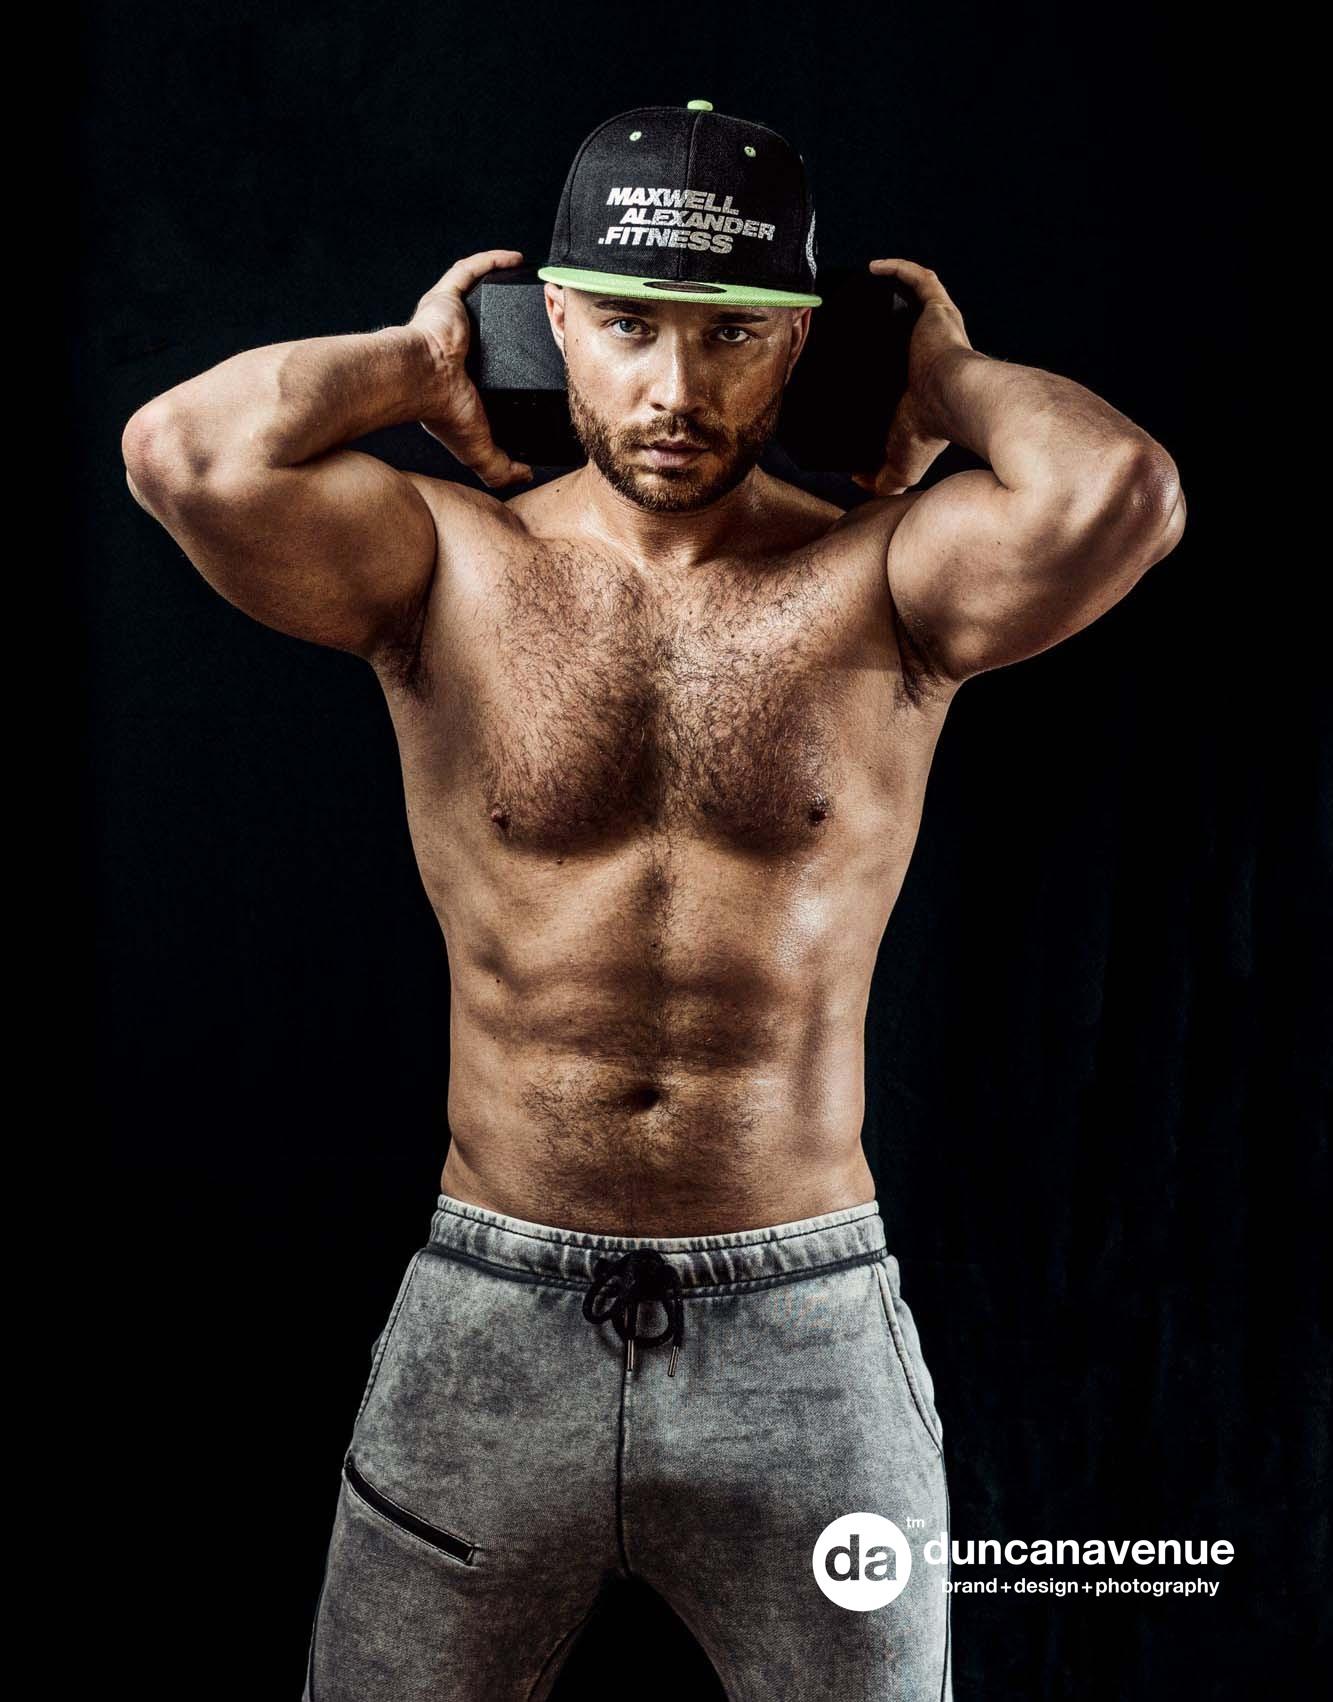 Fitness and Bodybuilding Coach Maxwell Alexander - Wellness, Nutrition, Bodybuilding